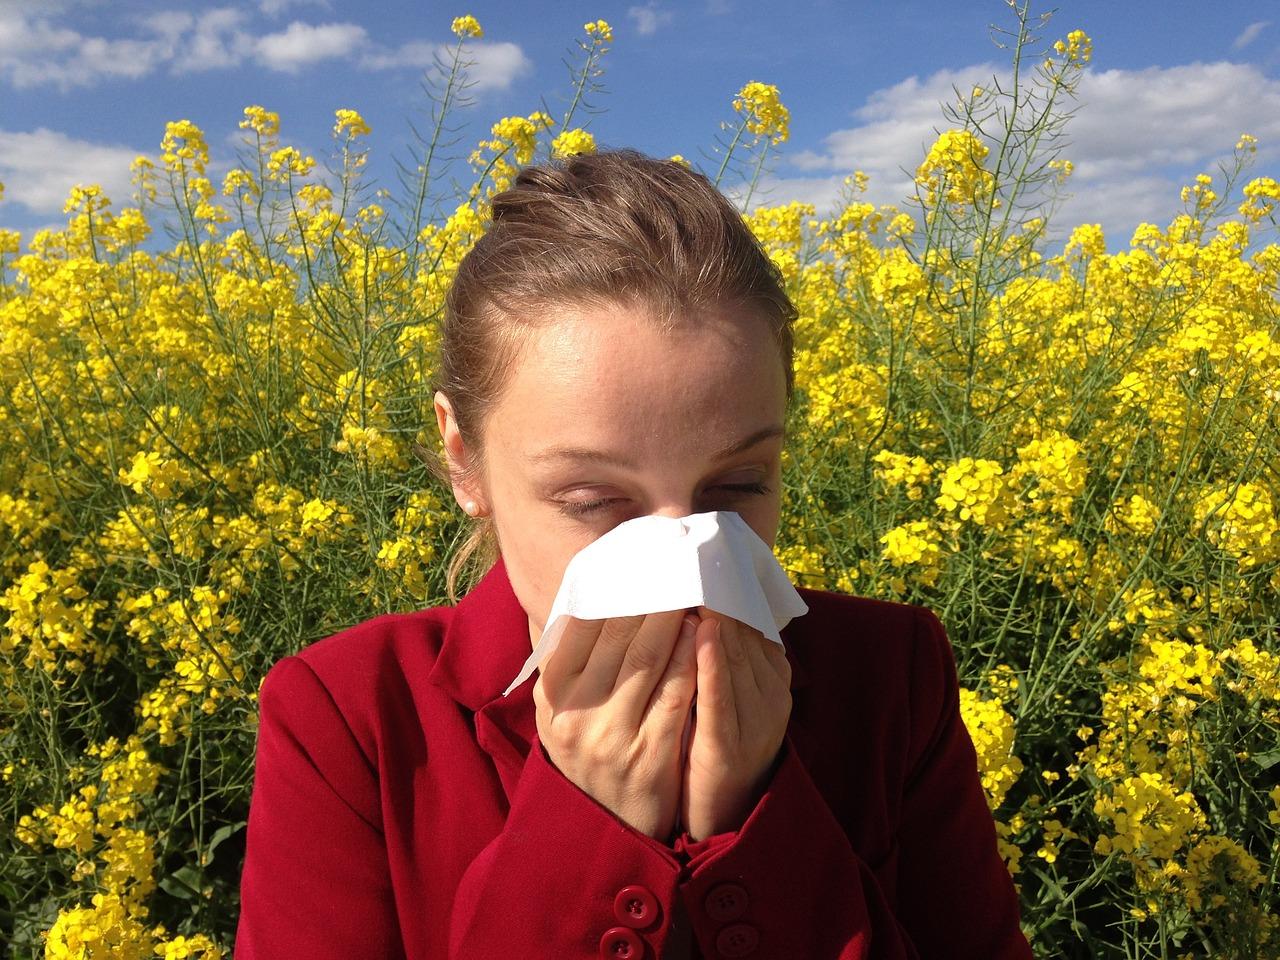 Durva napok várnak a pollenallergiásokra